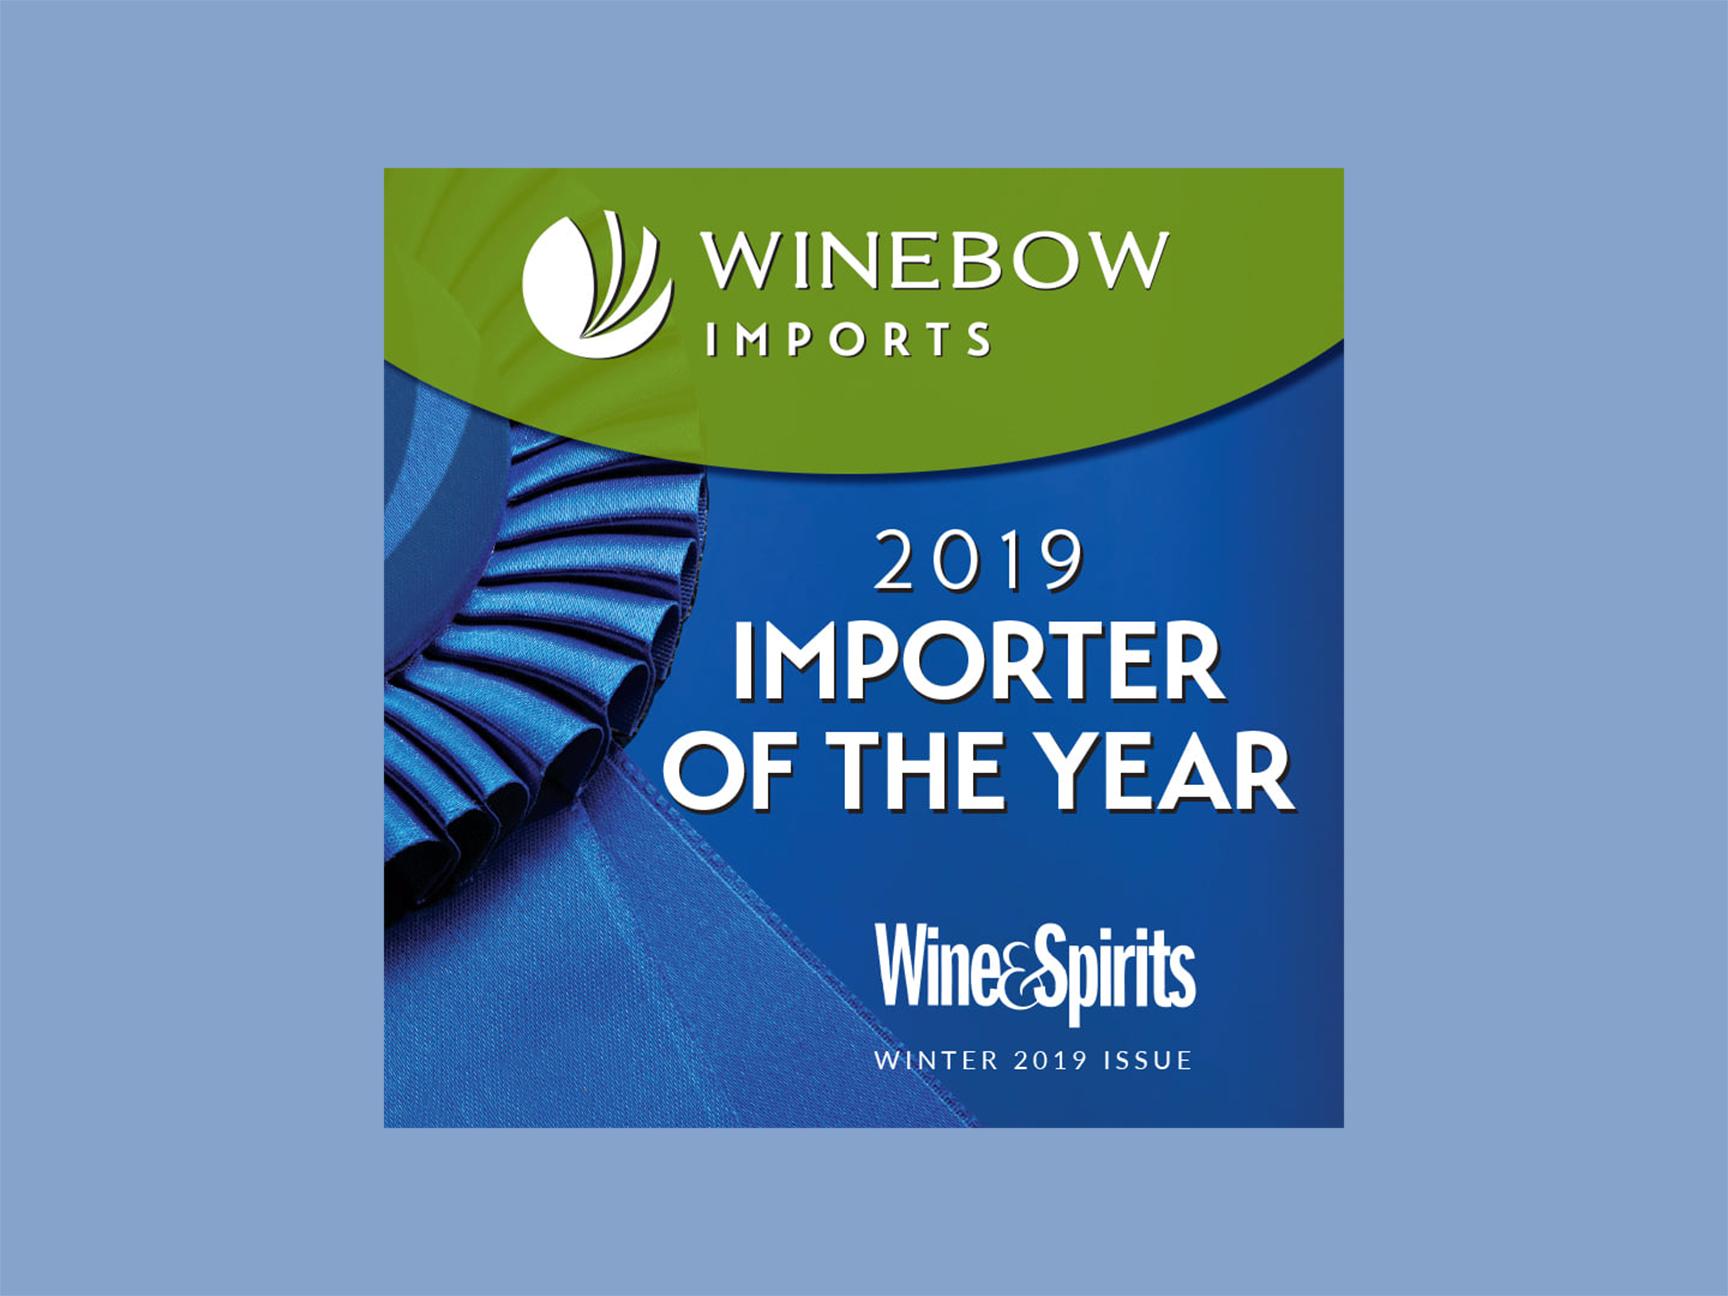 Wine Spirits Magazine Names Winebow Importer Of The Year 2019 Lini Lambrusco Usa